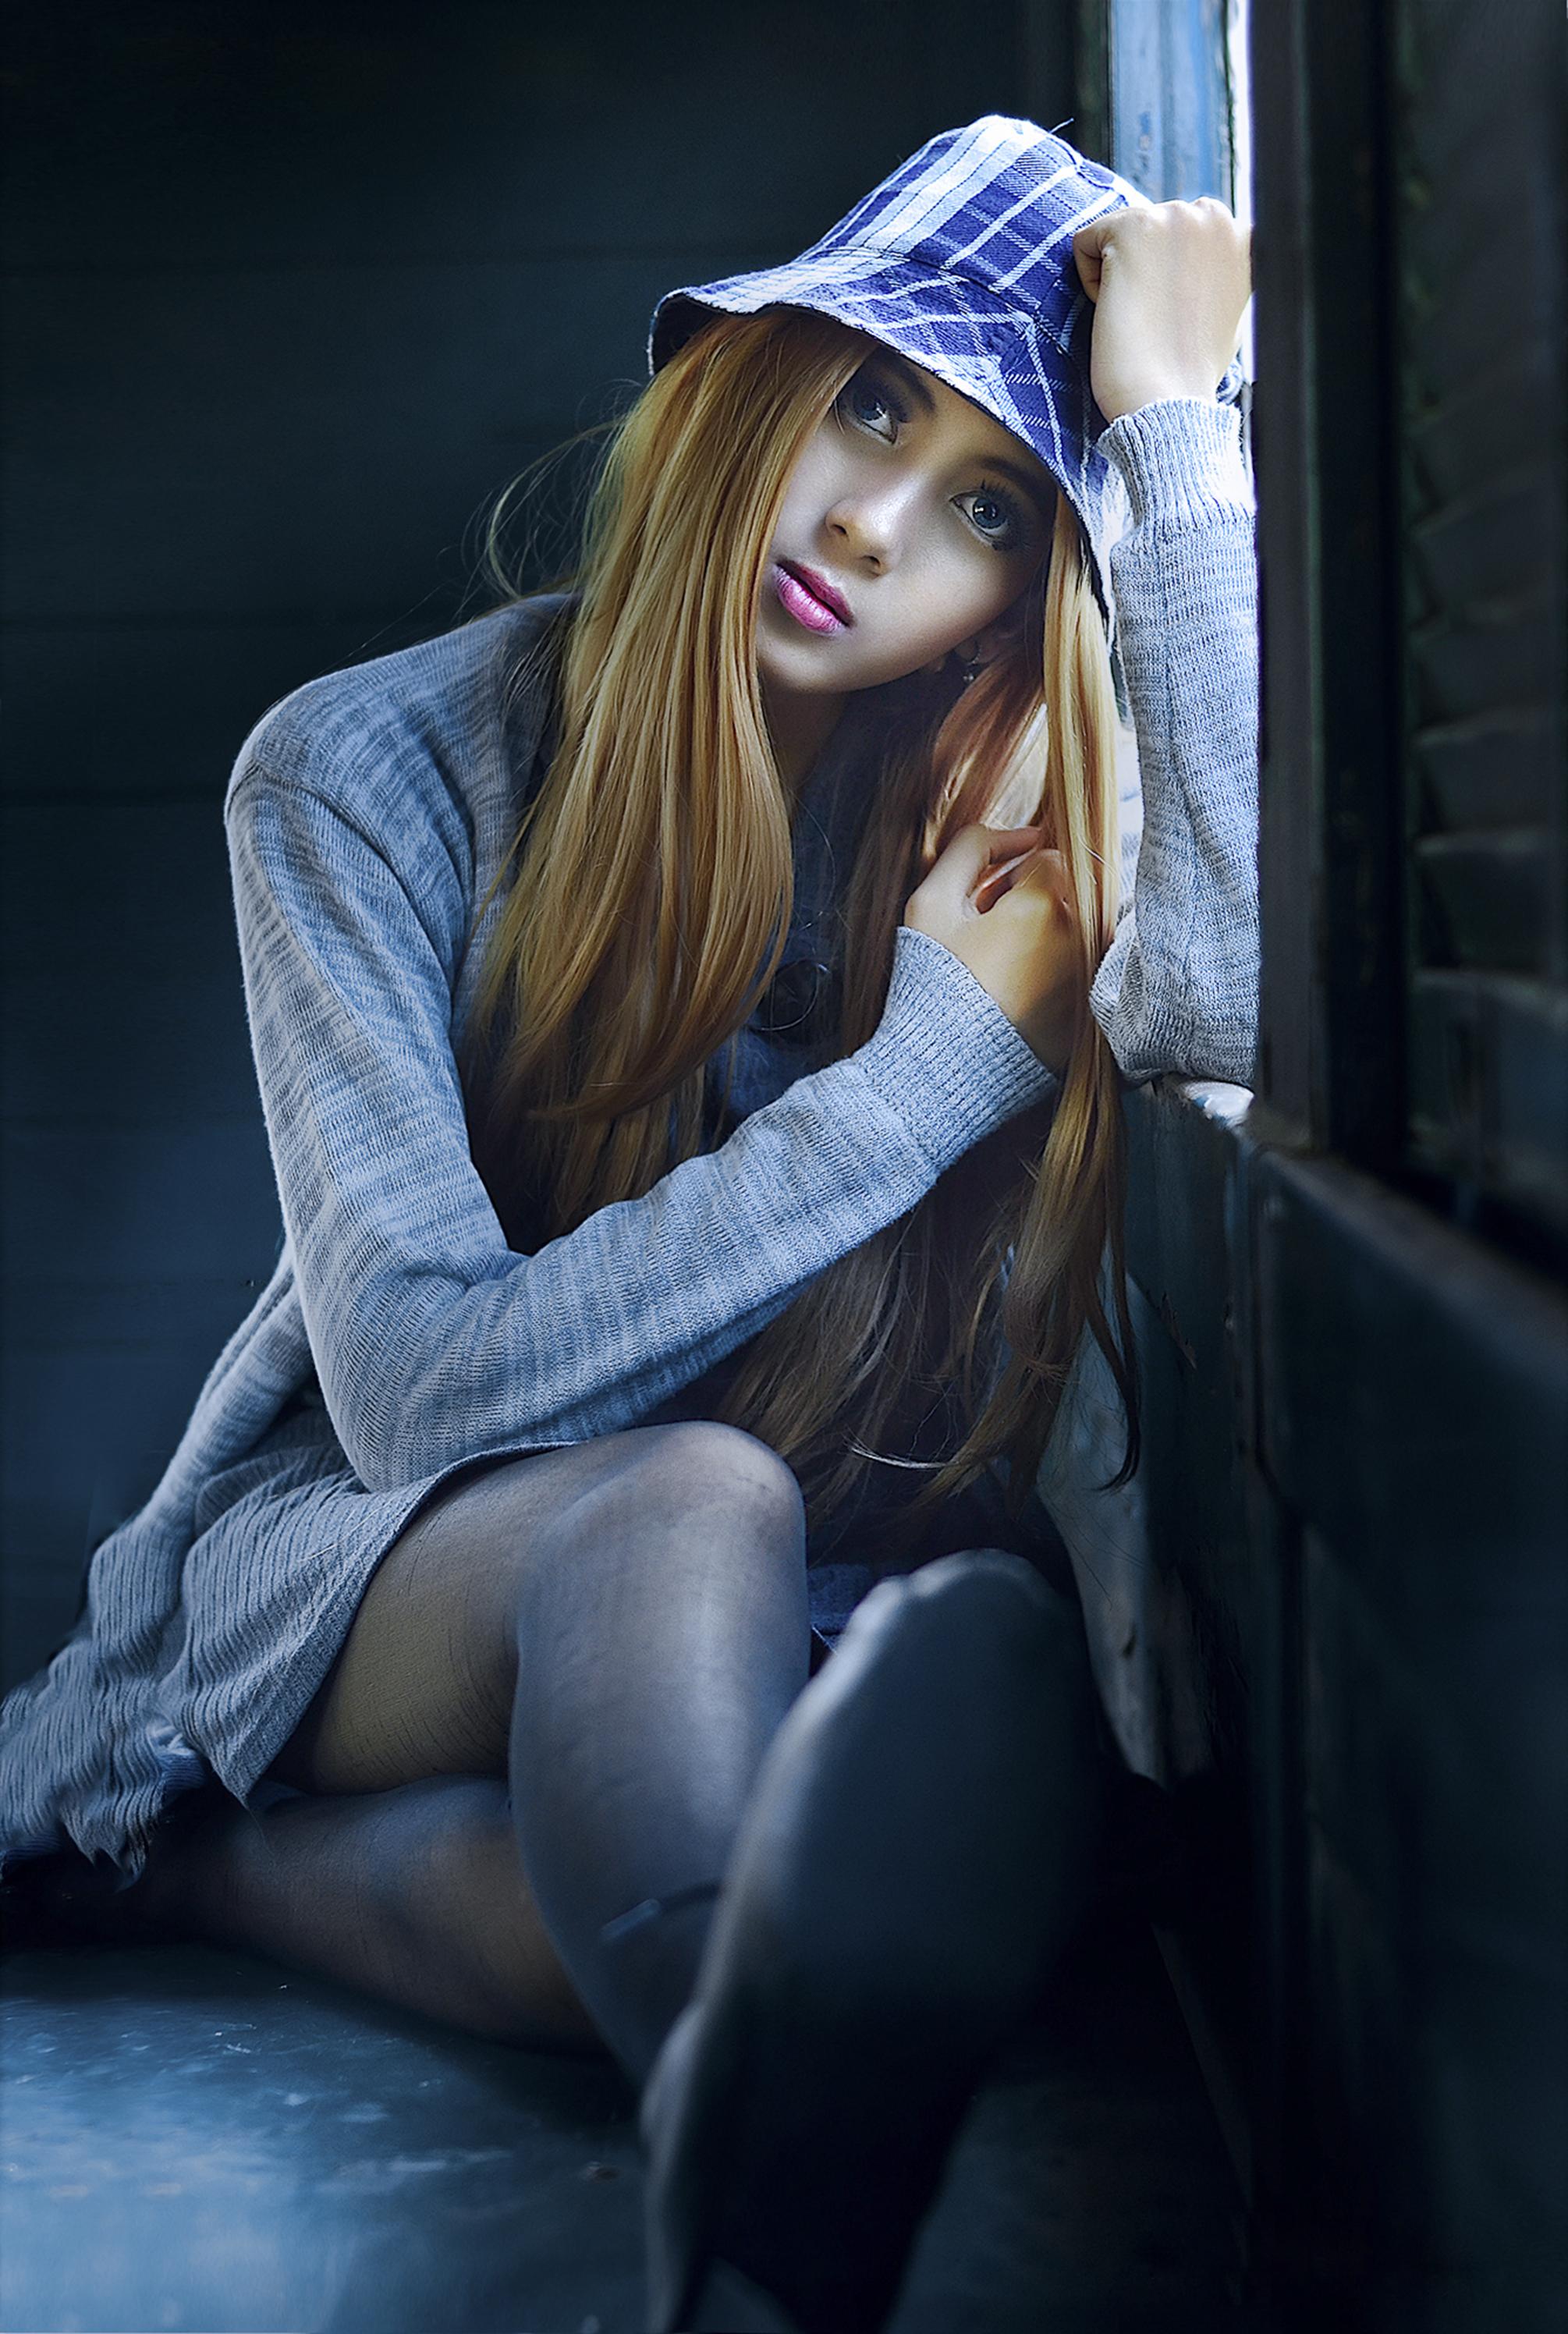 Cute Window 10 Wallpaper Free Stock Photo Of Adolescence Attractive Beautiful